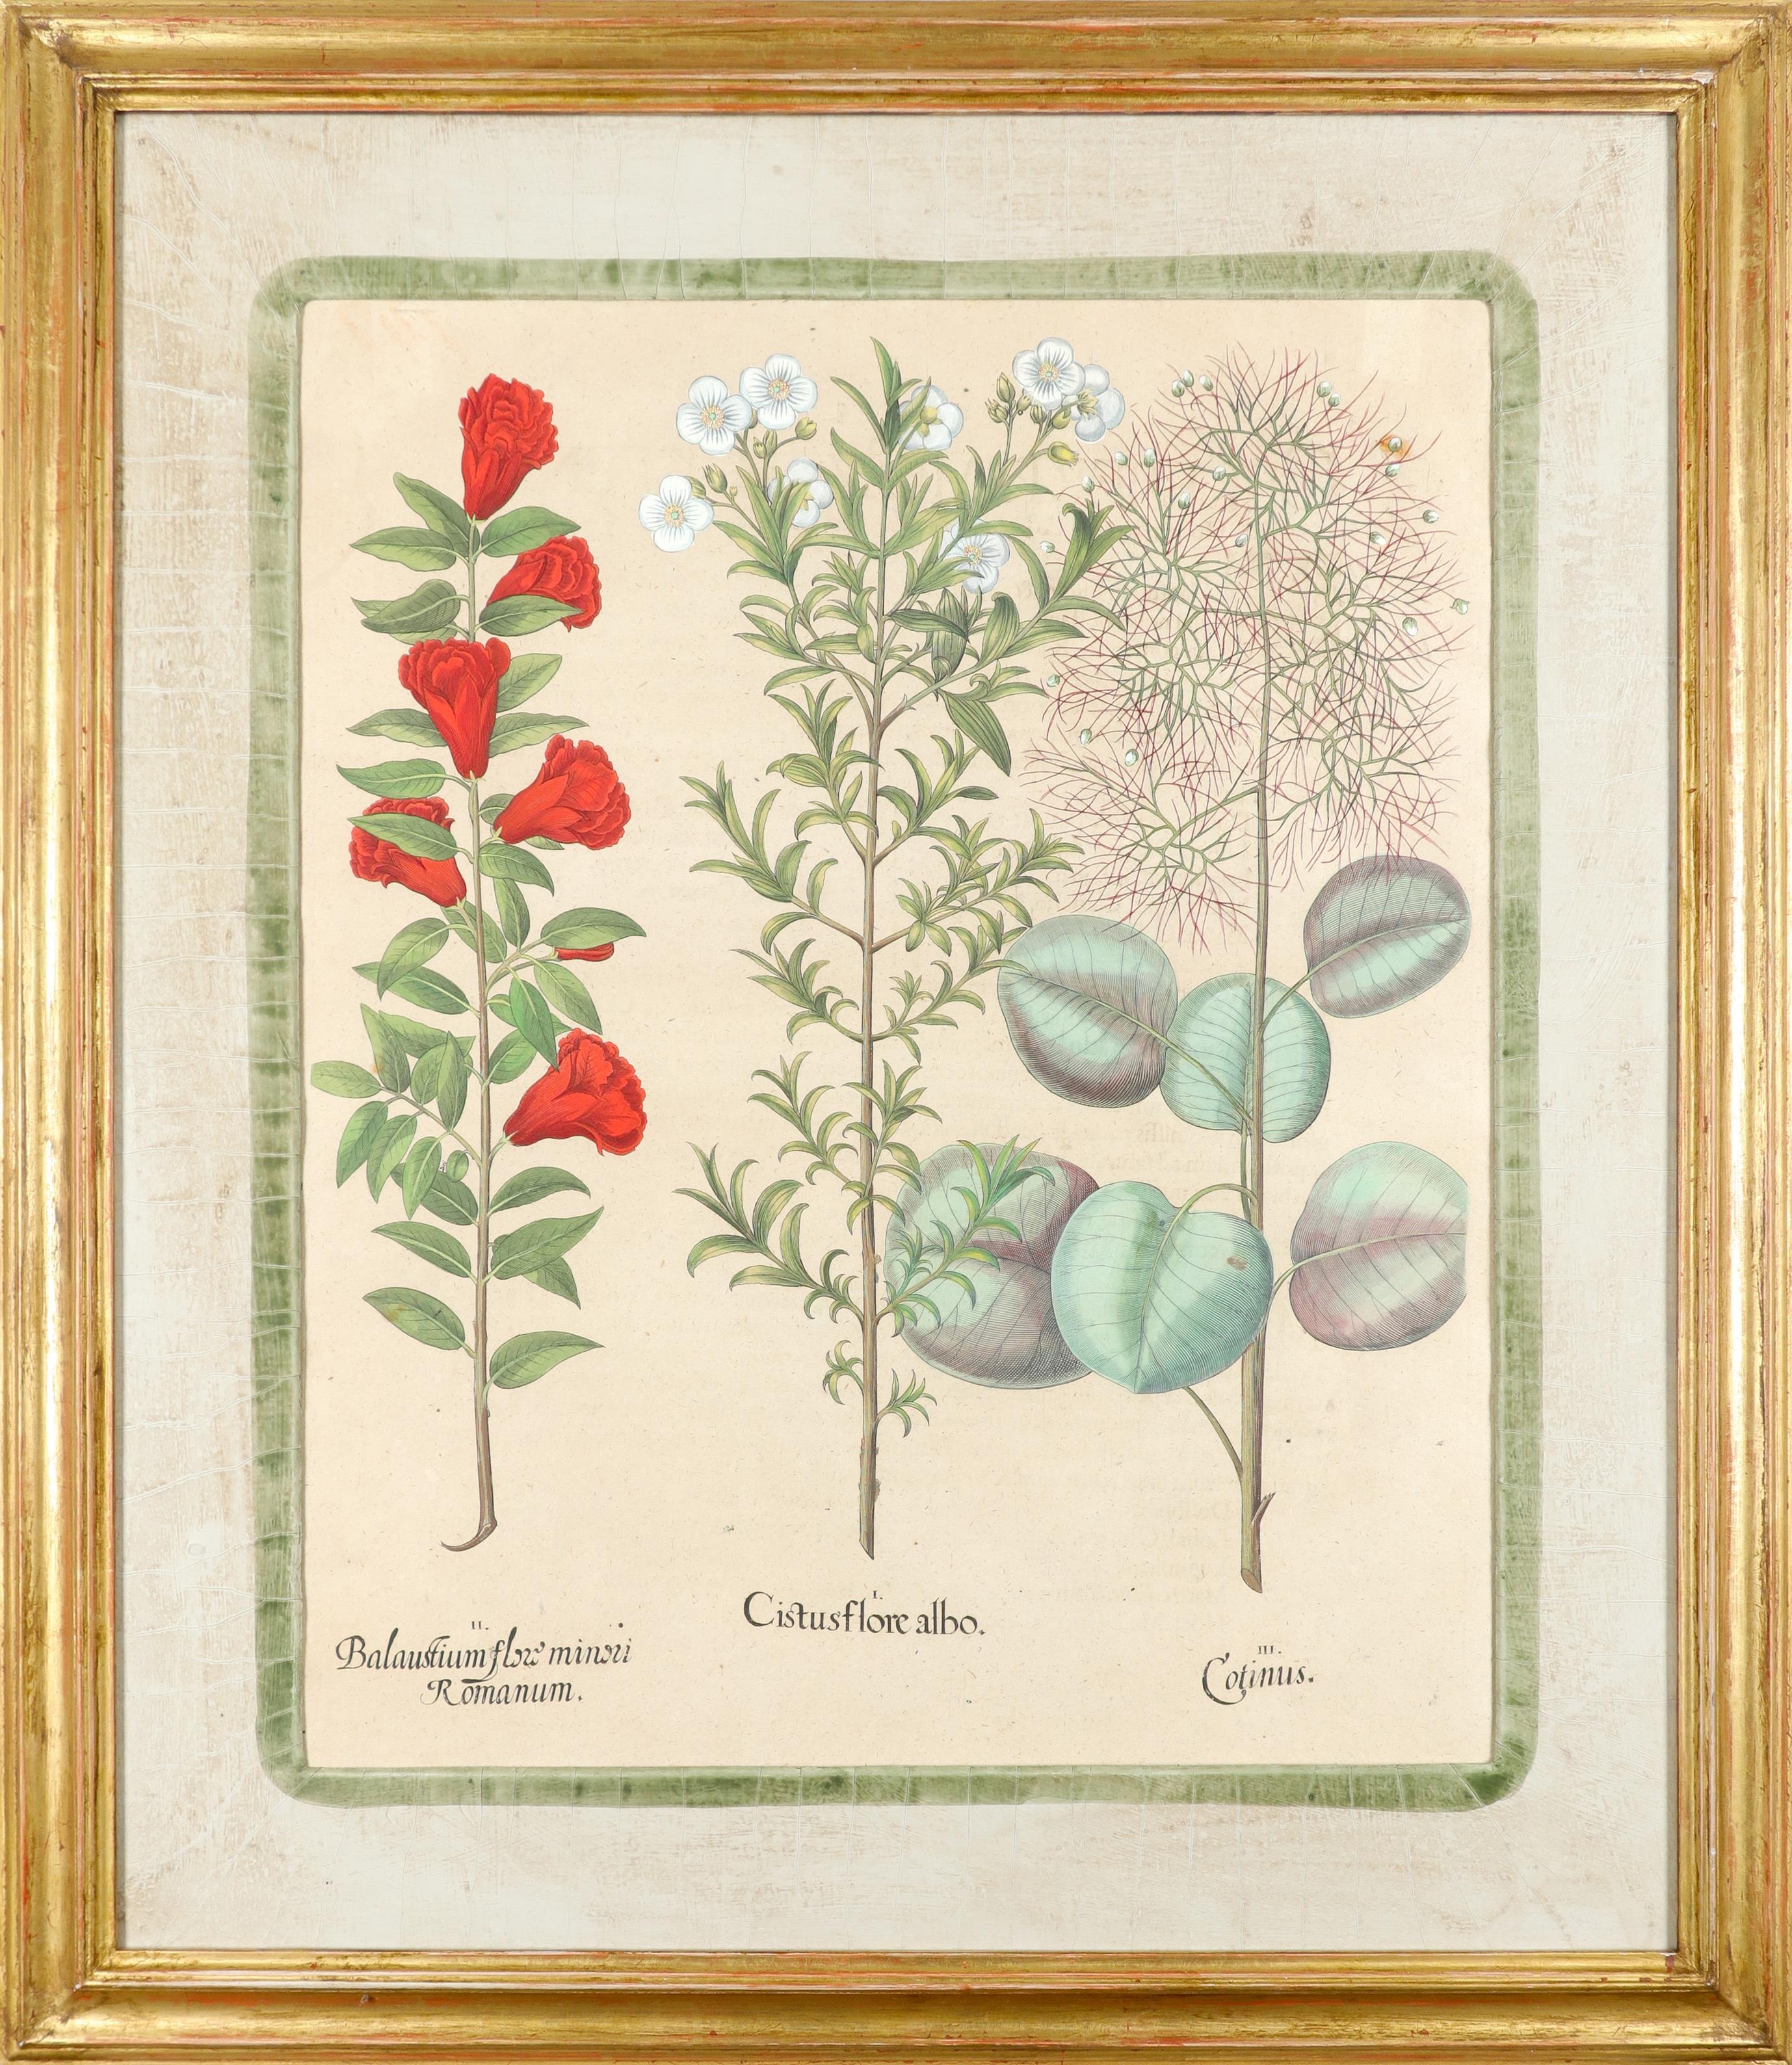 After Basilius Besler Poma flore multiplici; Aquilegia stellata flore vio laceo; Cytisus - Image 11 of 36